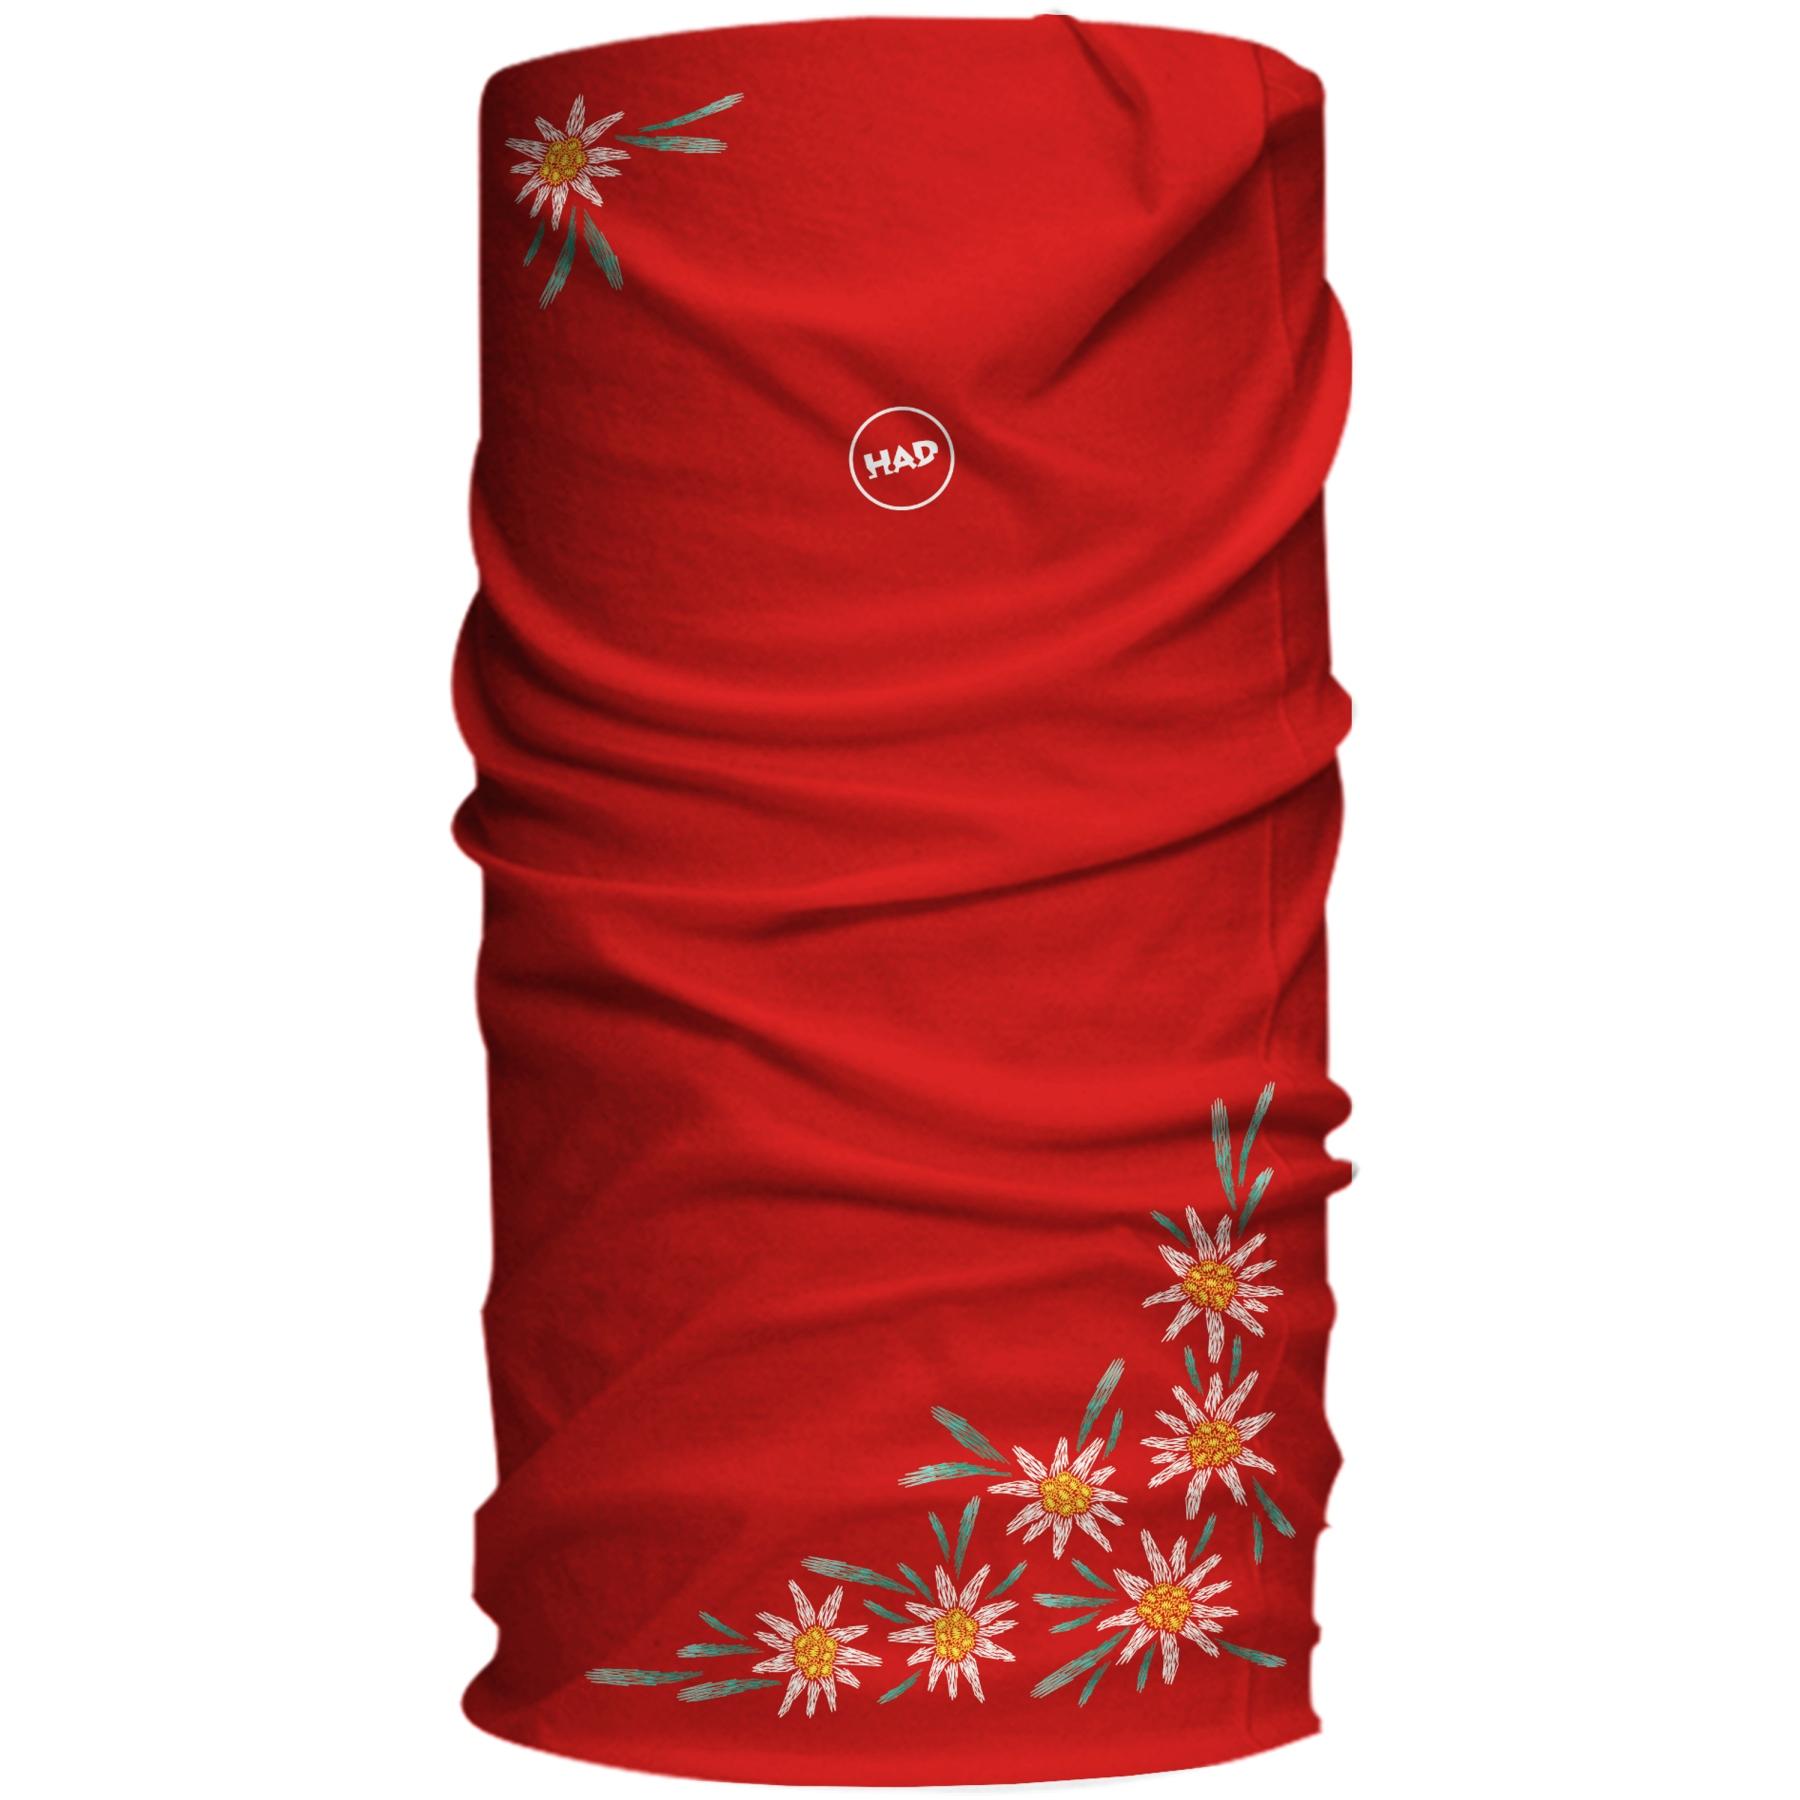 HAD Original Multifunctional Cloth - Stella Alpina Red